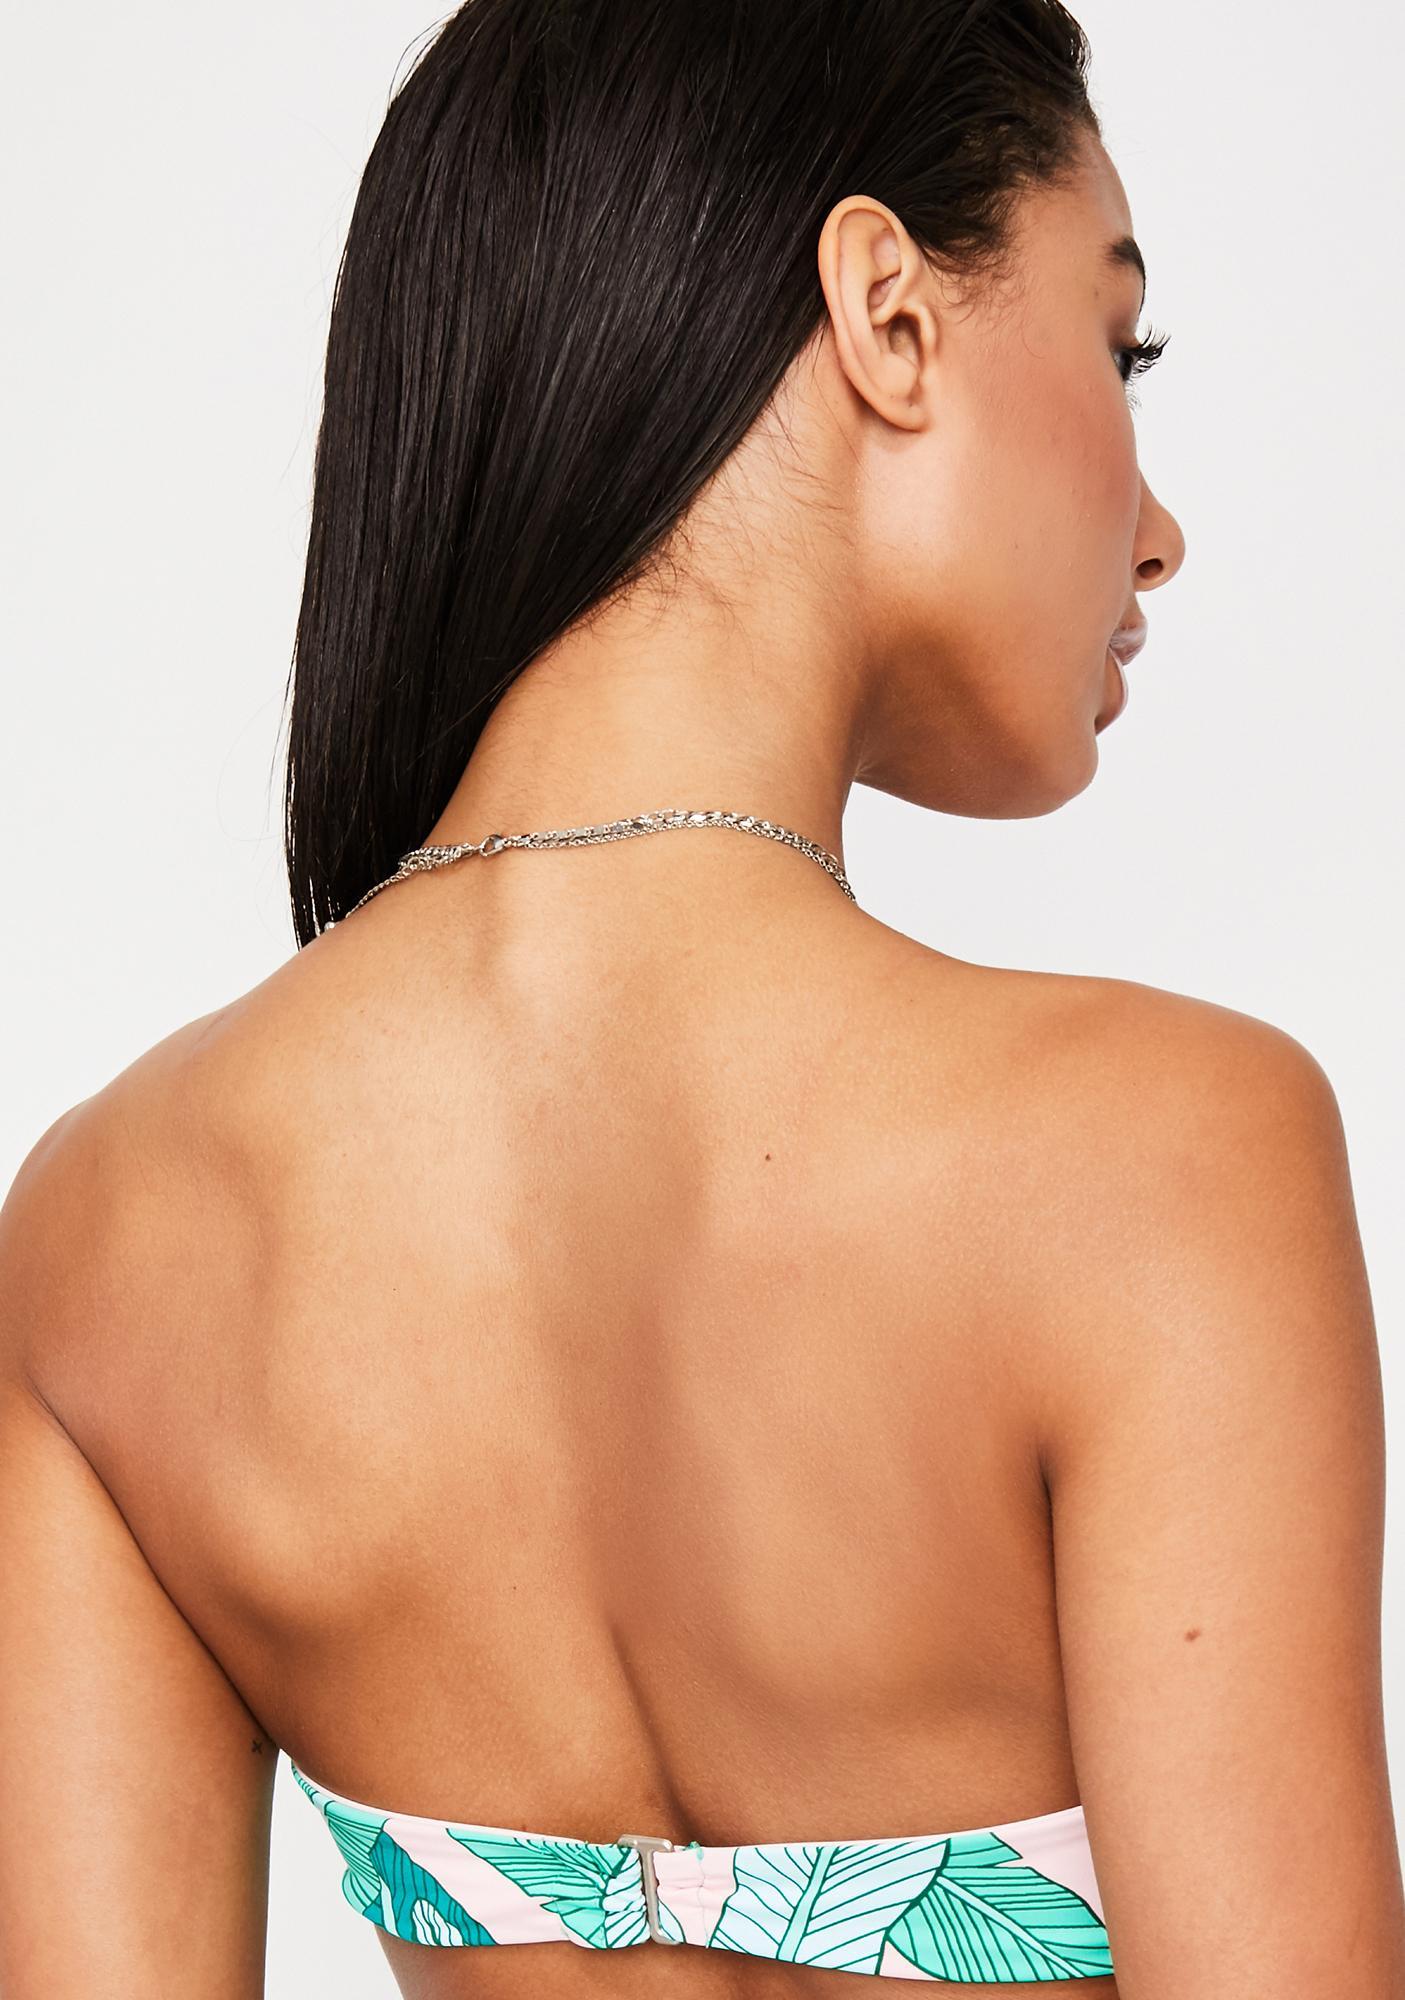 Dippin' Daisy's Icon Palm Bandeau Bikini Top